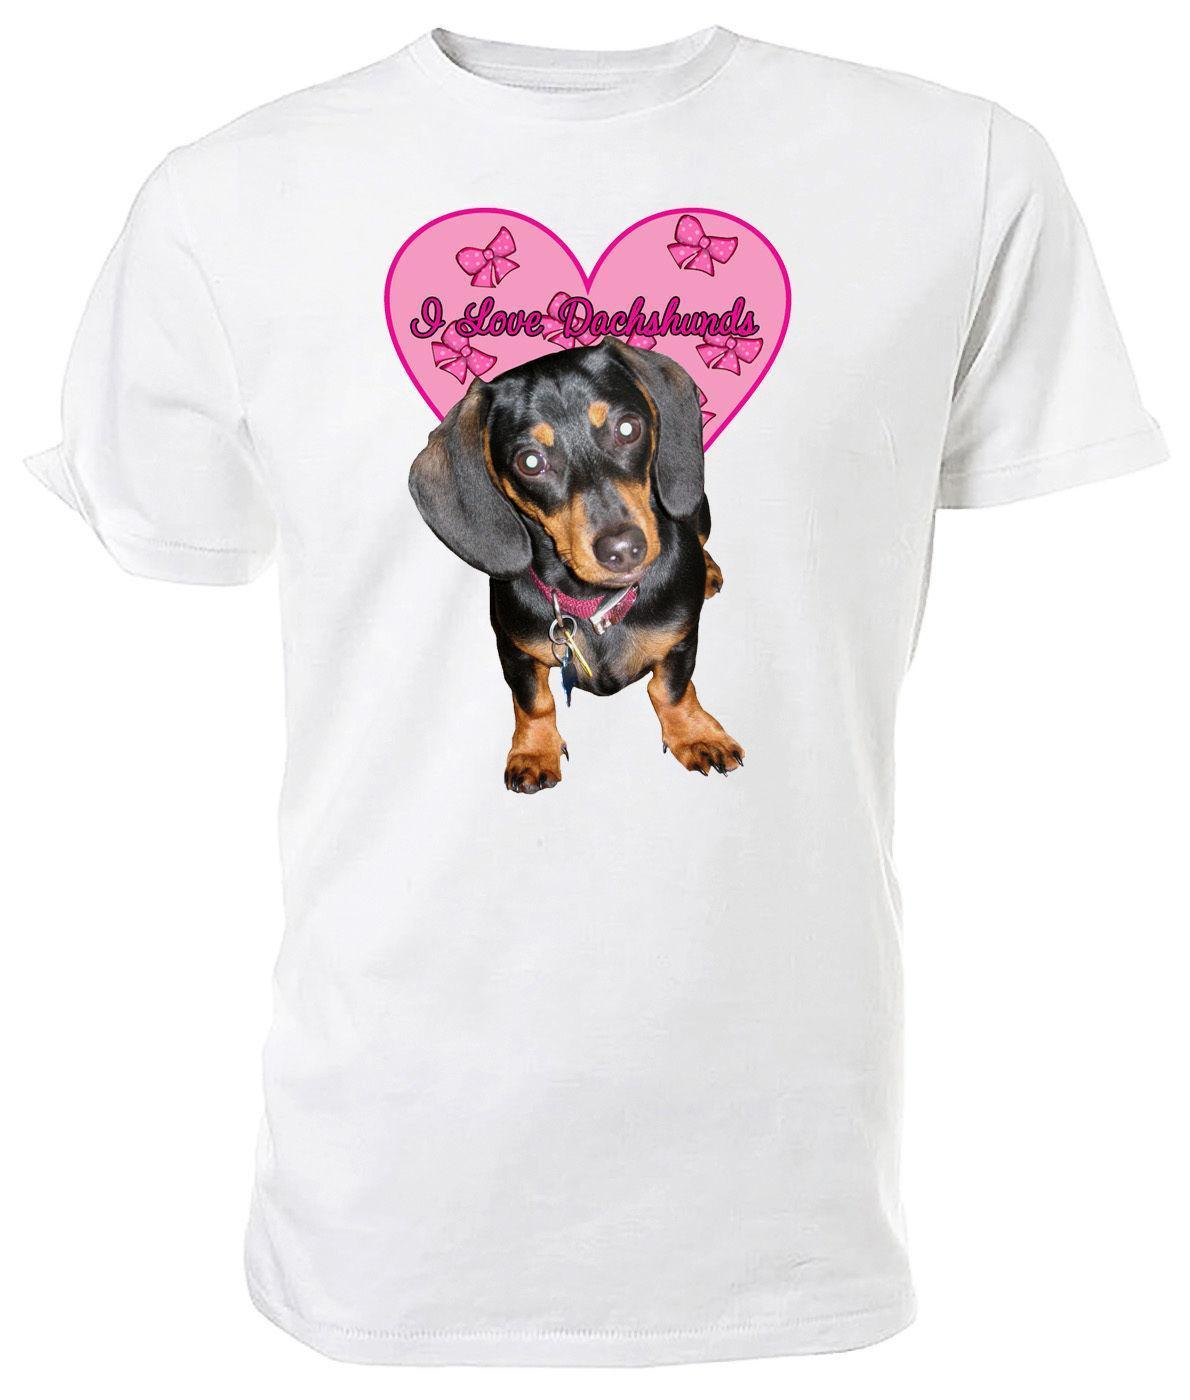 b2b5f2155 Dachshund Dog, I Love Dachshunds T Shirt Choice Of Size & Colours! Novelty T  Shirt Funny Printed T Shirts From Jie71, $14.67| DHgate.Com